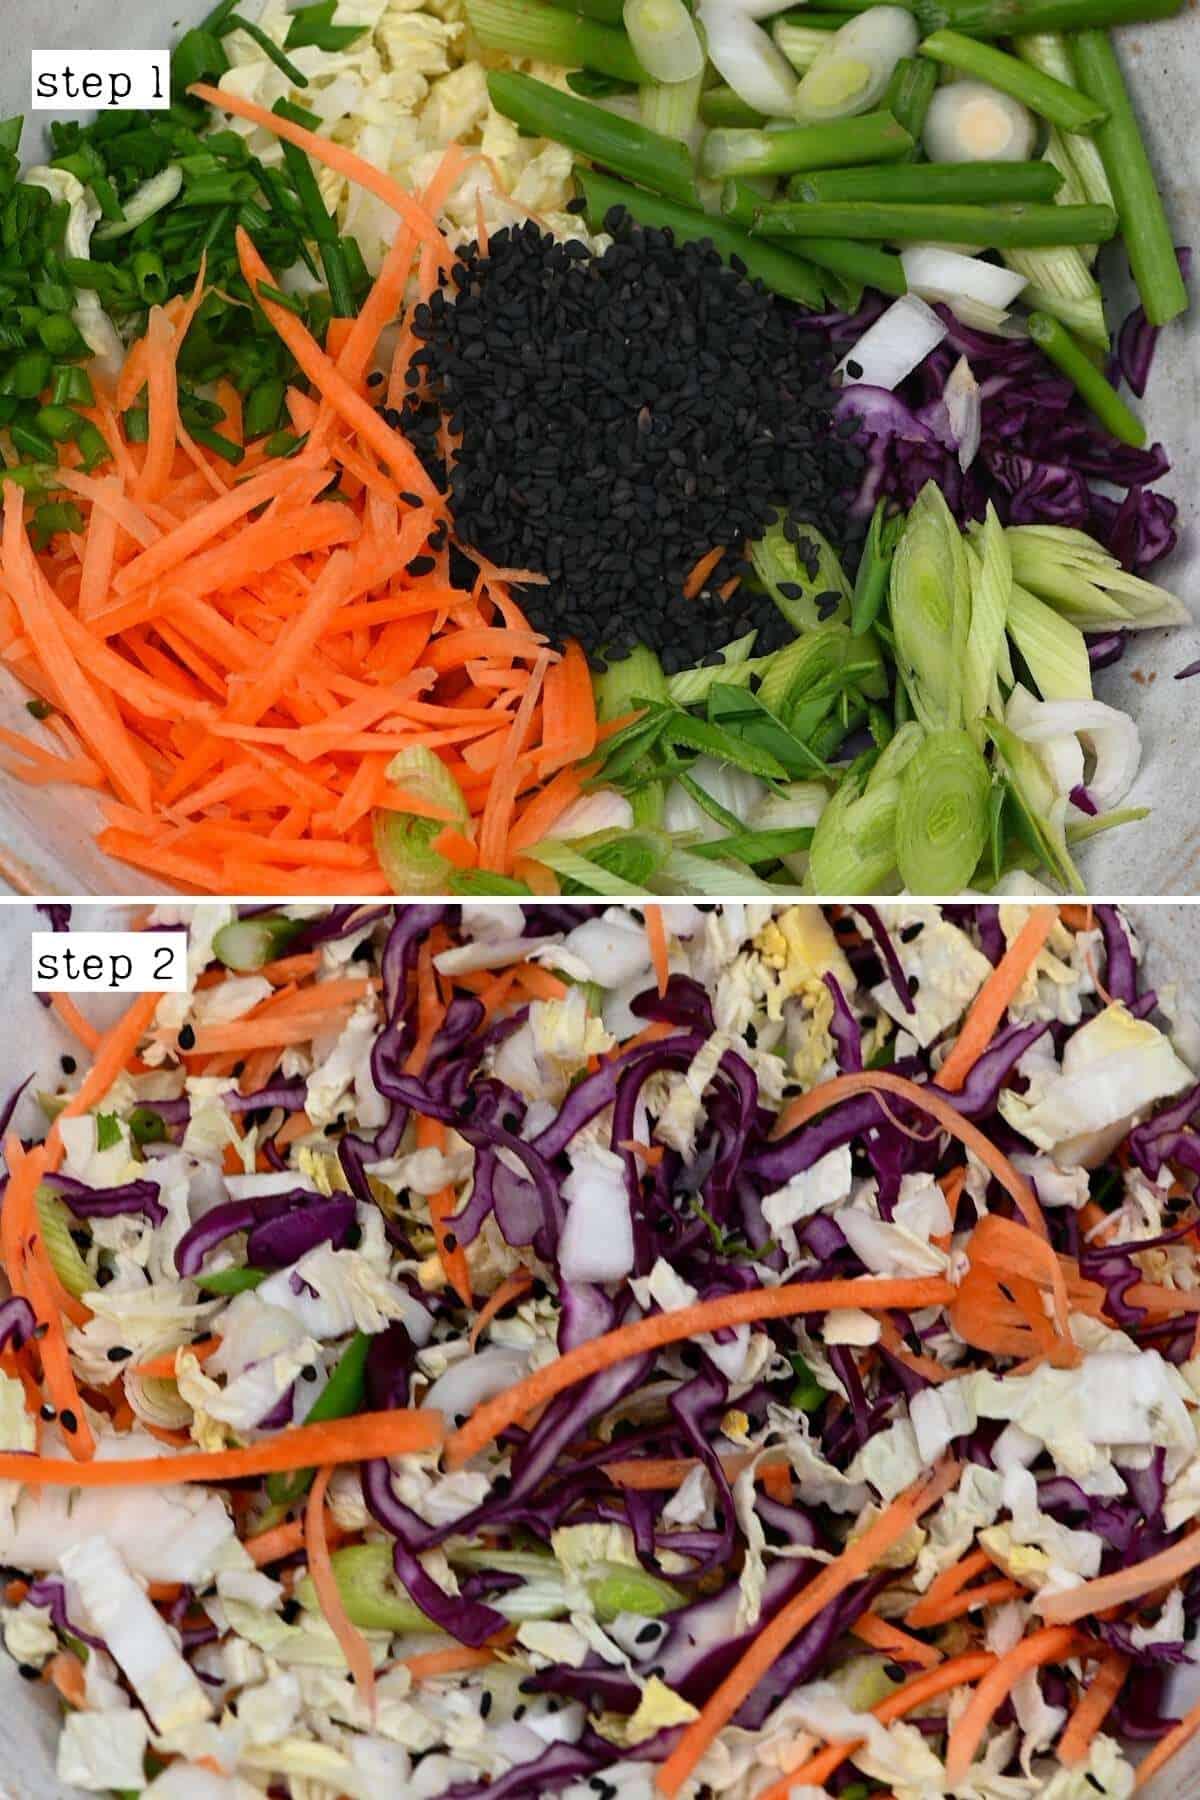 Steps for mixing shredded vegetables